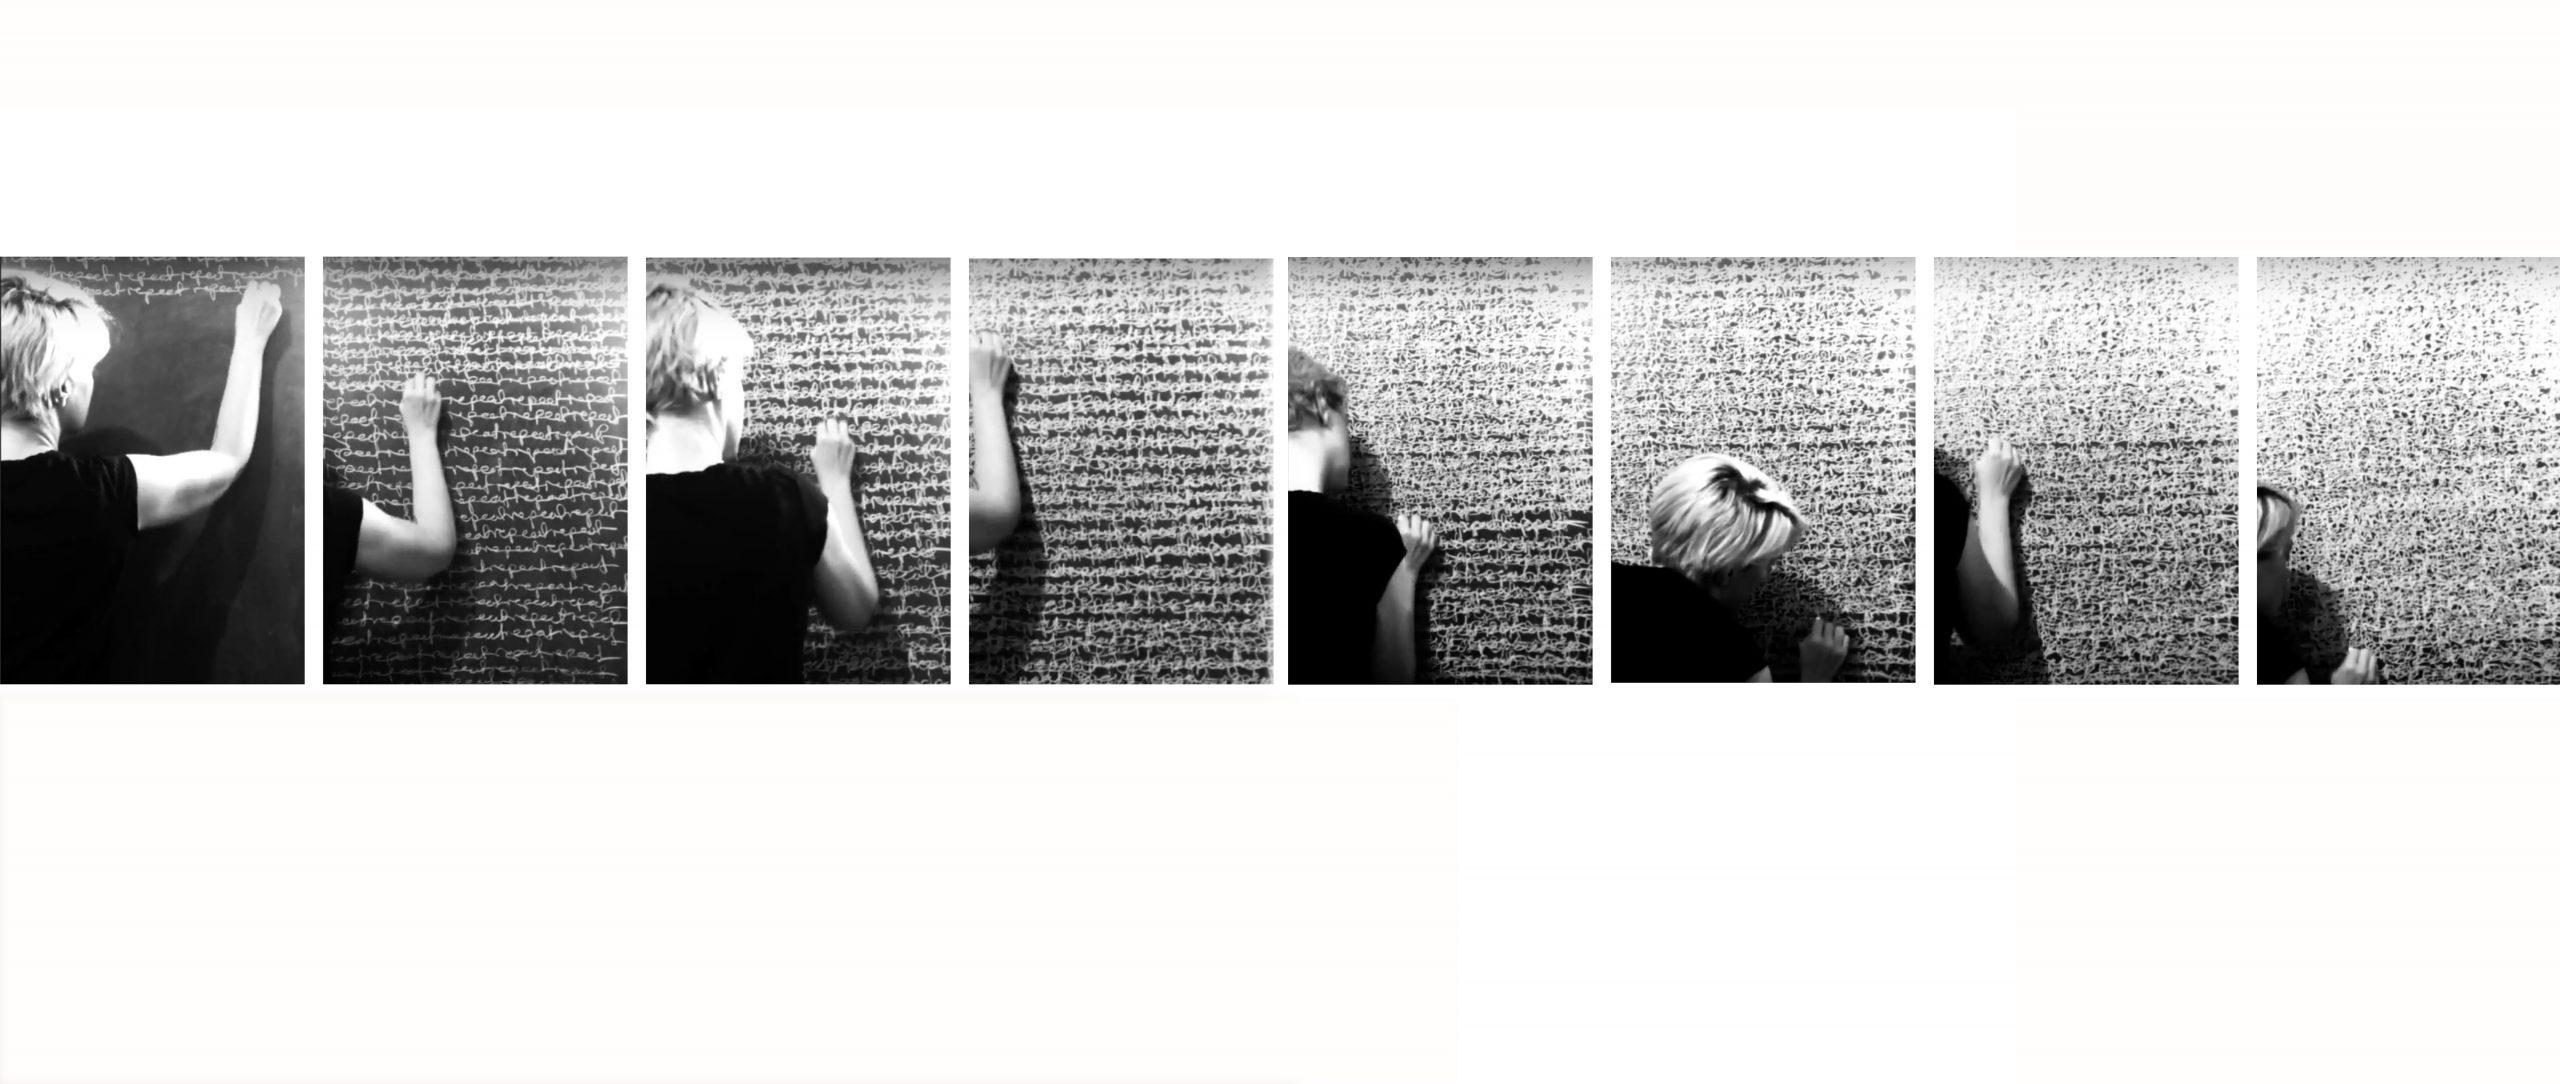 Sara Morawetz, 'Repeat Repeat', 2014 / 2019, durational performance and artefact, 90 x 150 cm diptych